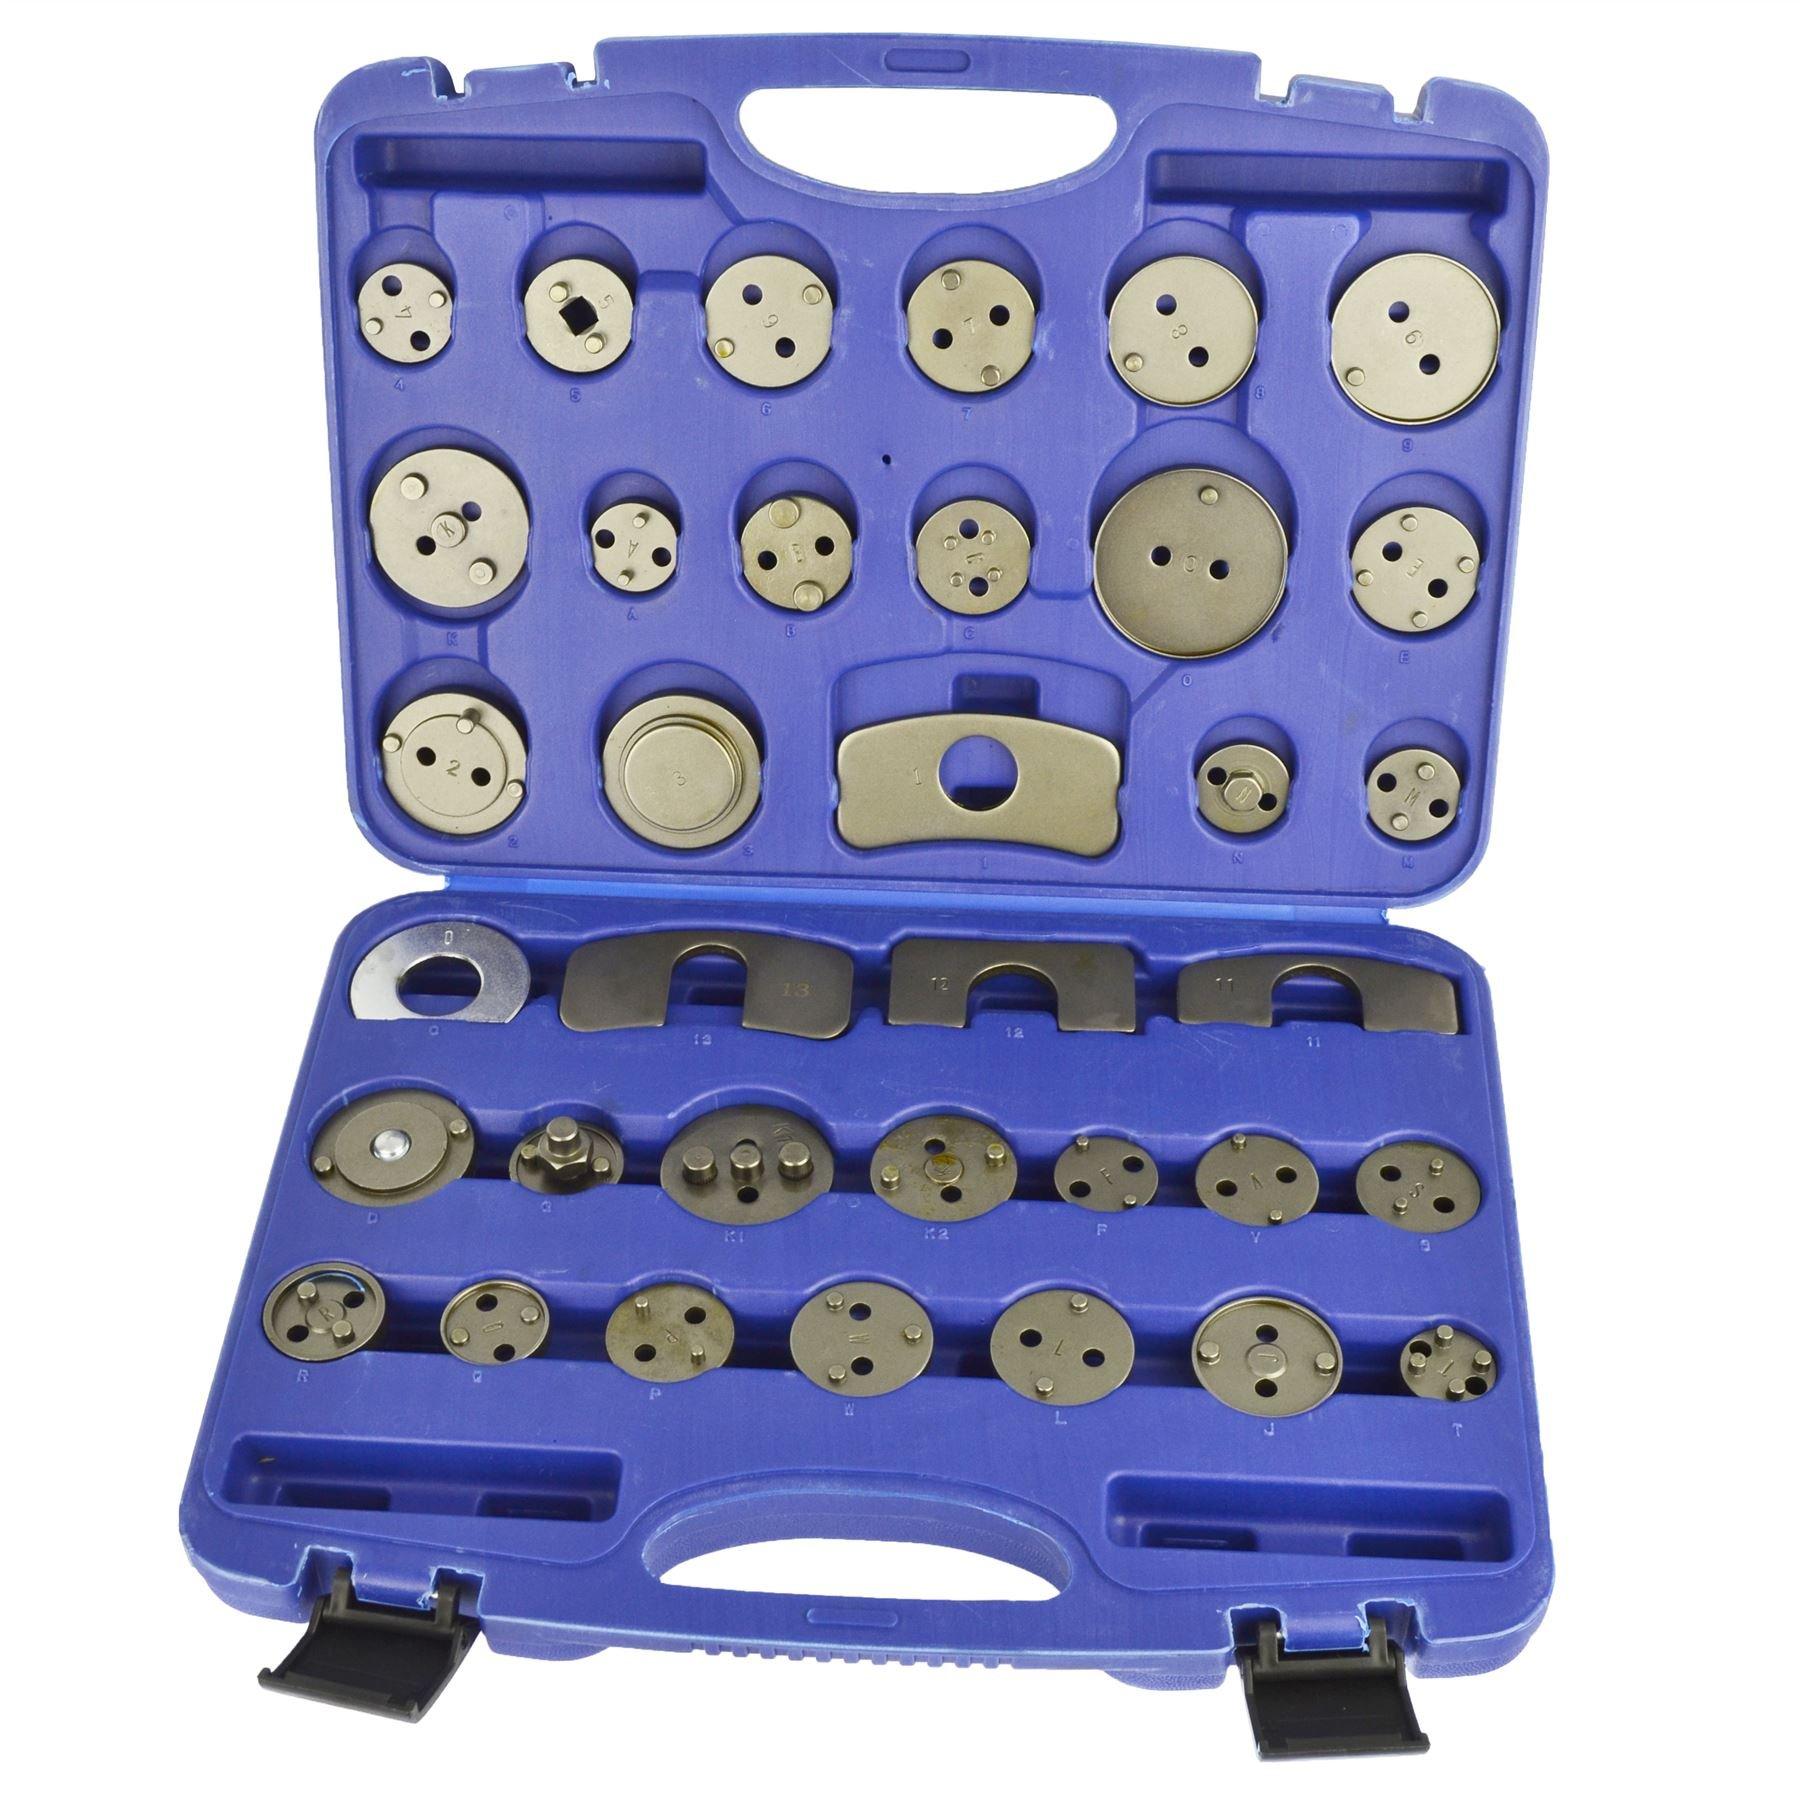 AB Tools-US Pro 35pc Universal Brake Calliper Pad Piston Wind Back Adaptor Adapter Set